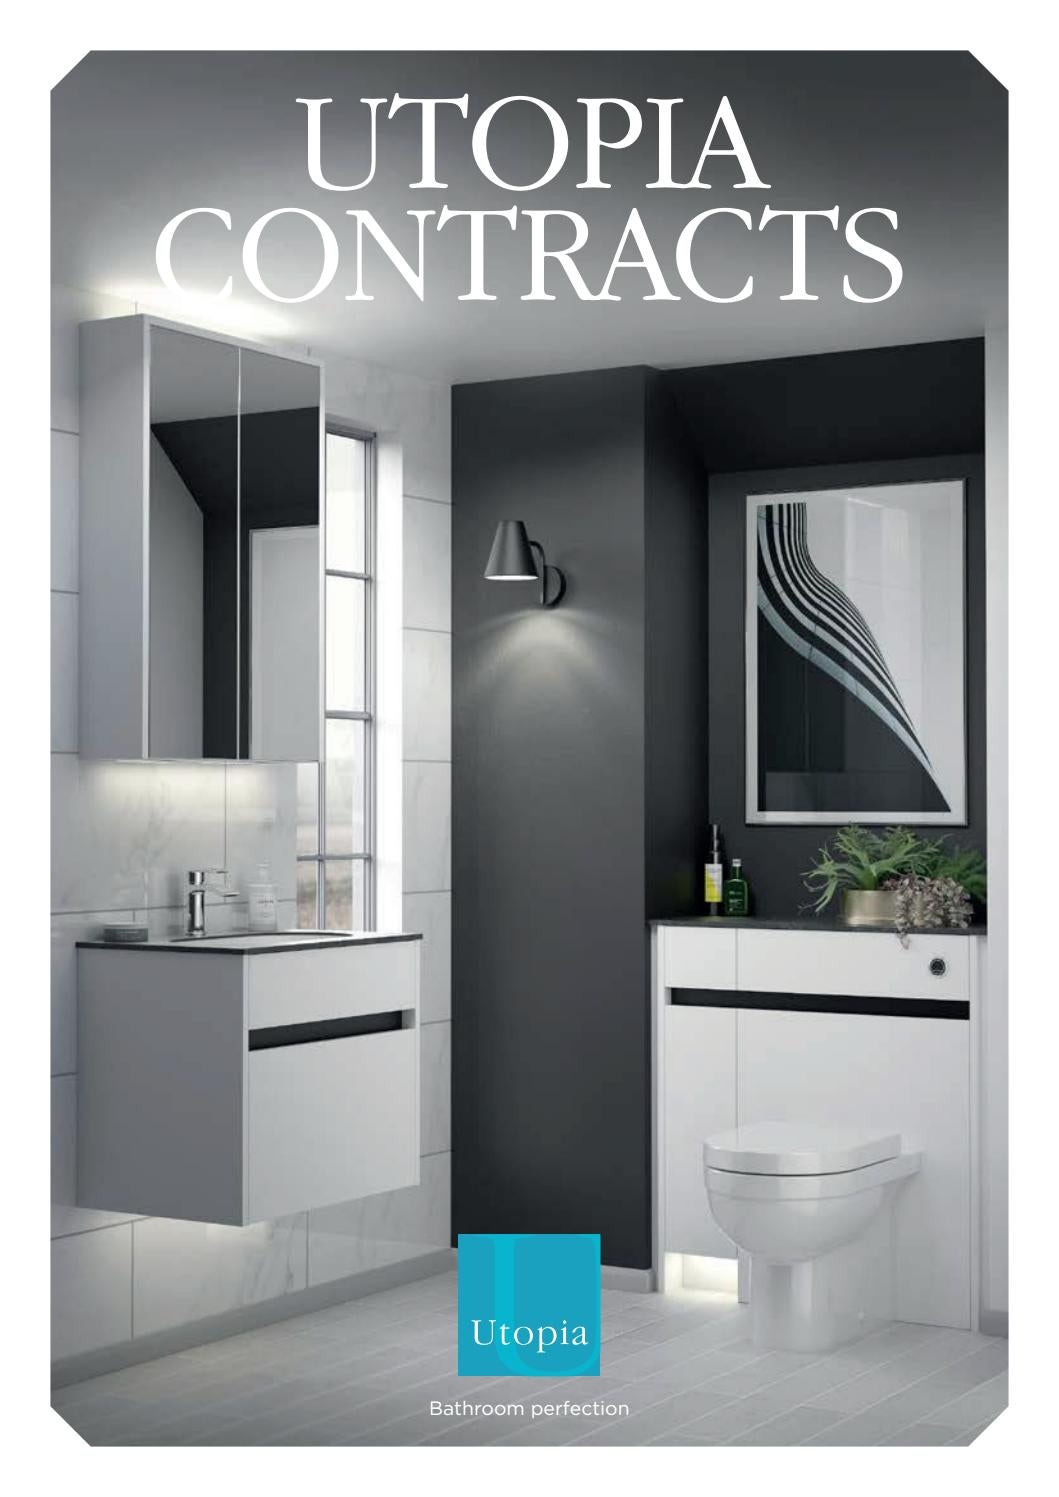 Utopia Bathrooms Contracts Brochure by iDM Design - issuu